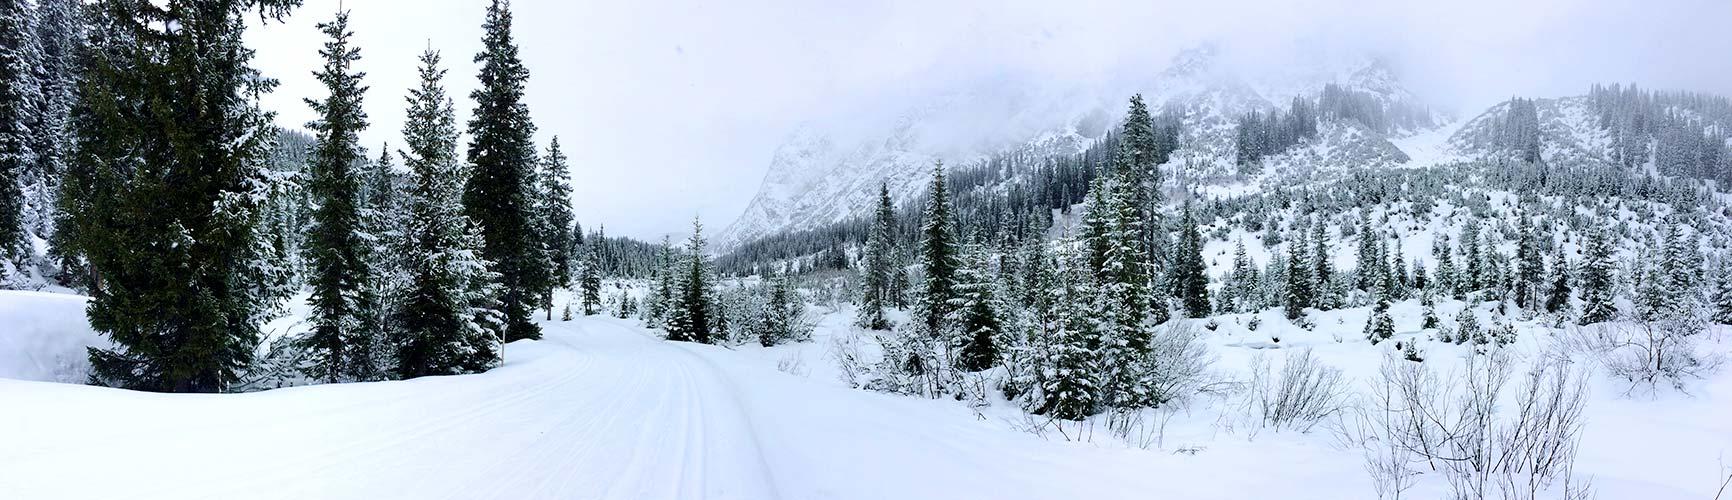 Alternativen zum Schifahren | Langlaufen | Bergland Appartements in Lech am Arlberg | Skiurlaub auf 1600m | Zahlreiche Kilometer Langlauf-Loipen